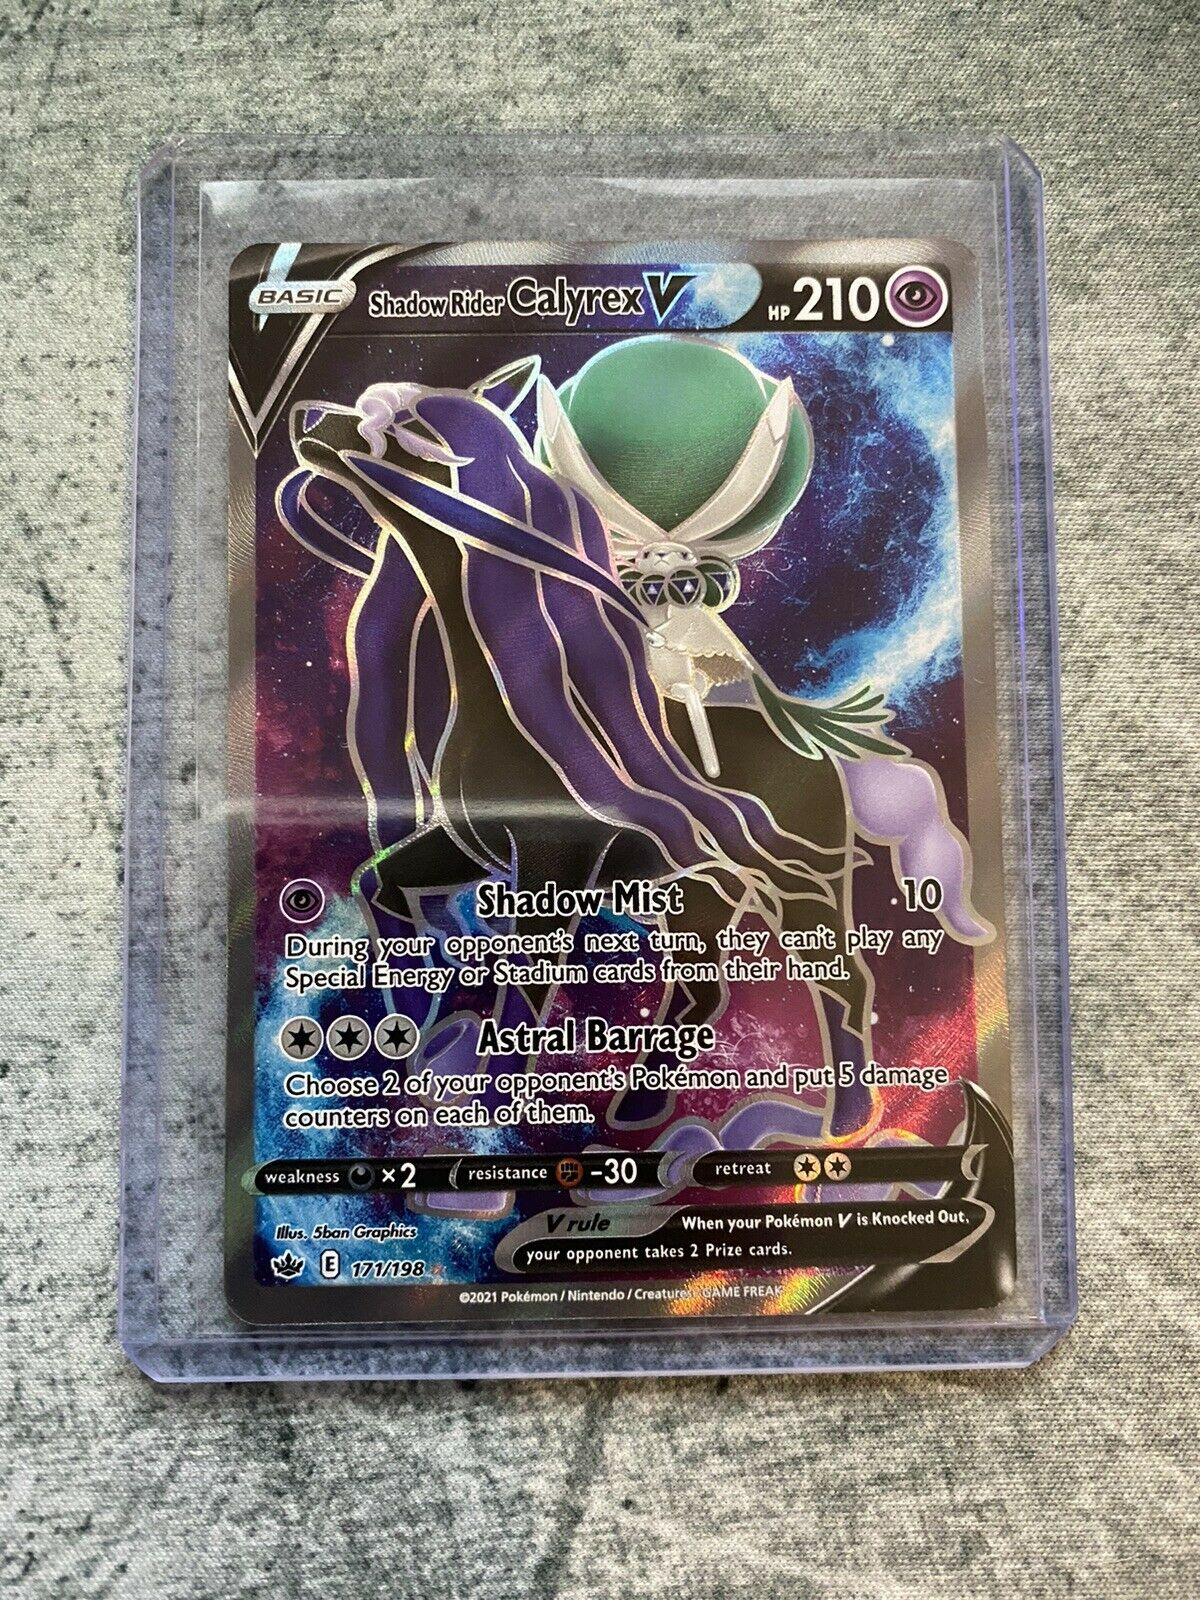 Pokémon Shadow Rider Calyrex V Full Art 171/198 Chilling Reign